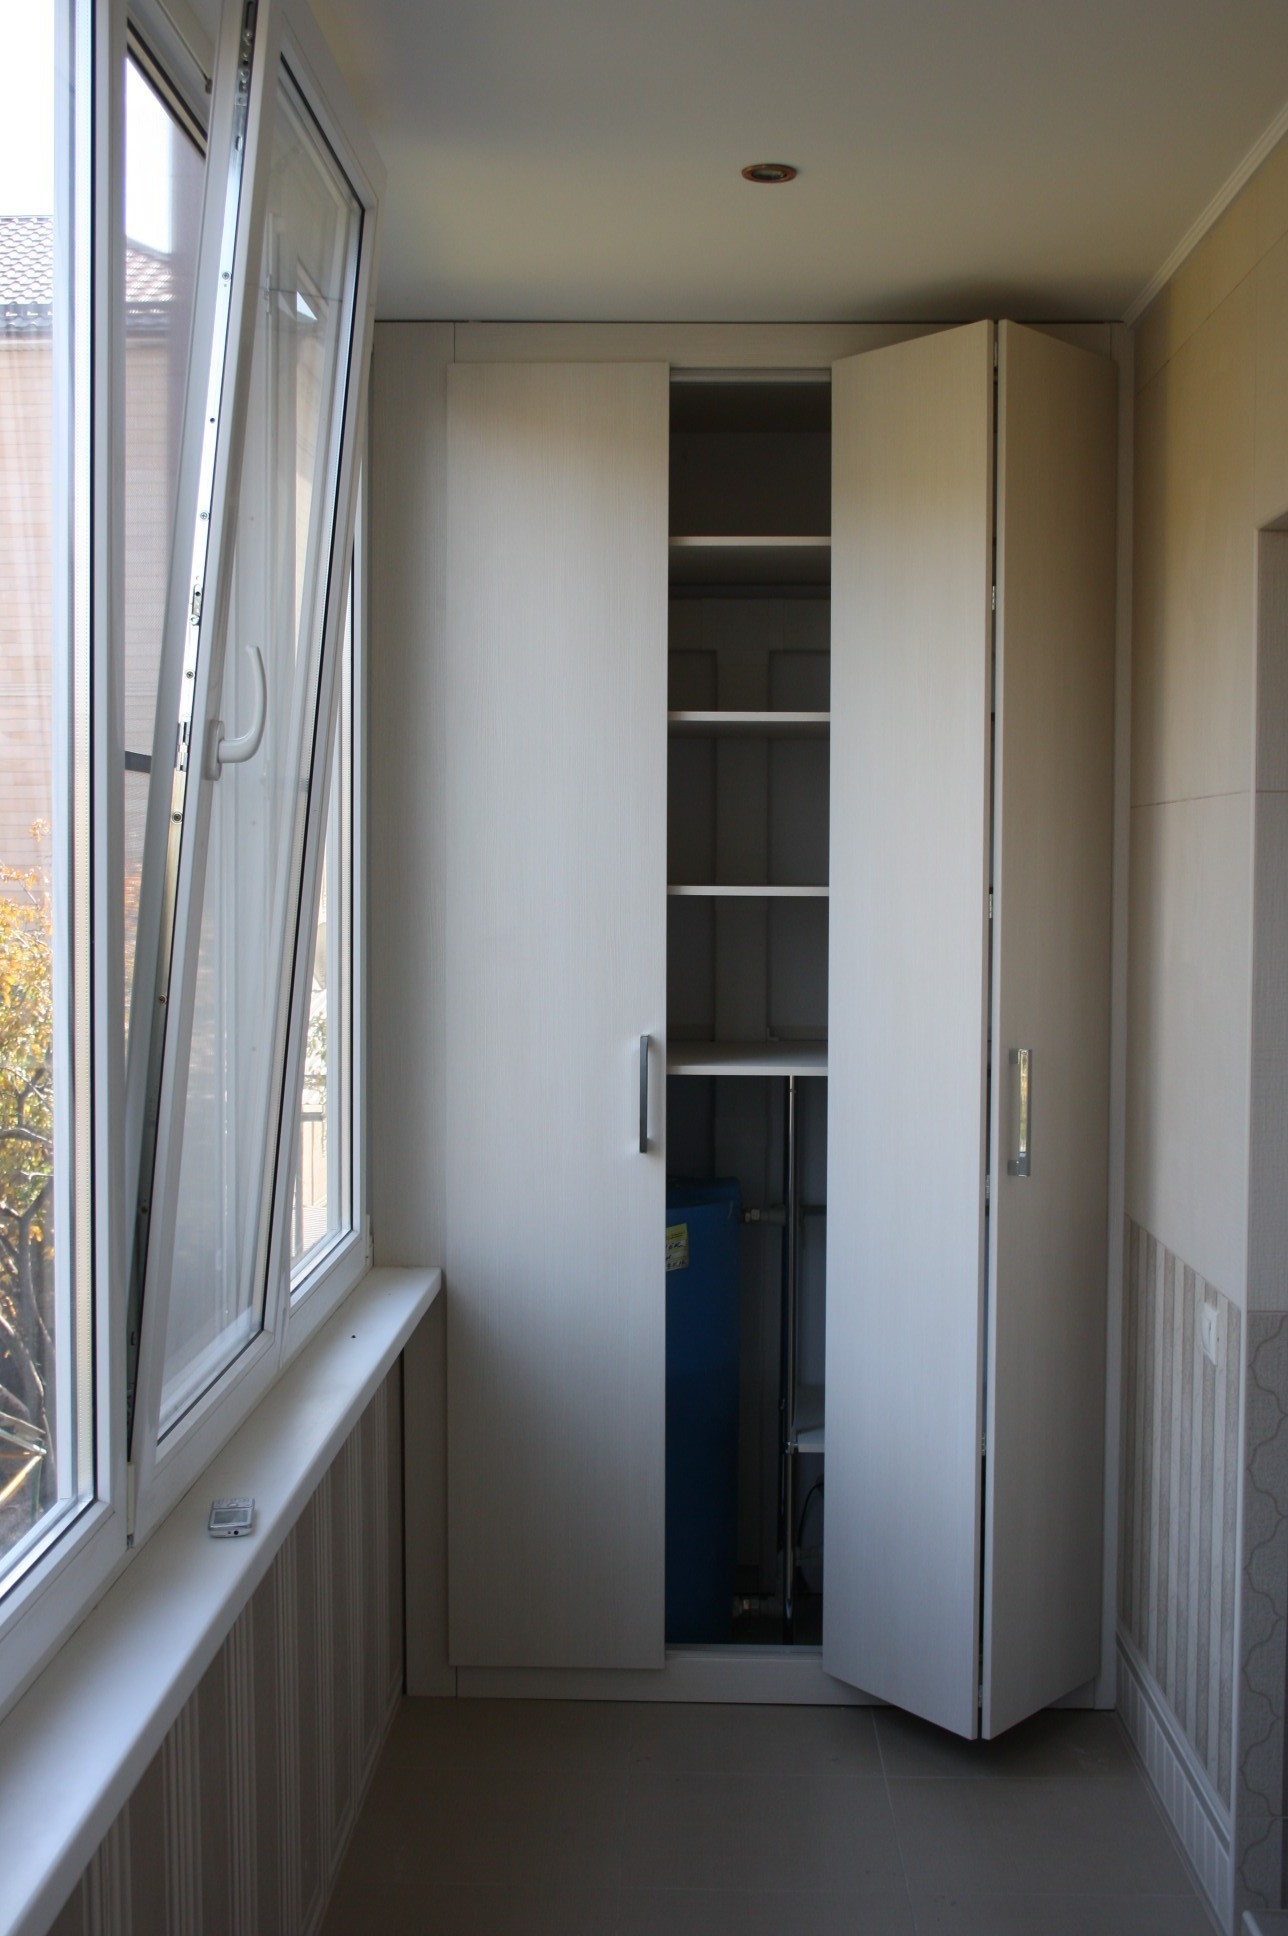 Шкаф на балкон, лоджию своими руками with для балкона 77 кру.